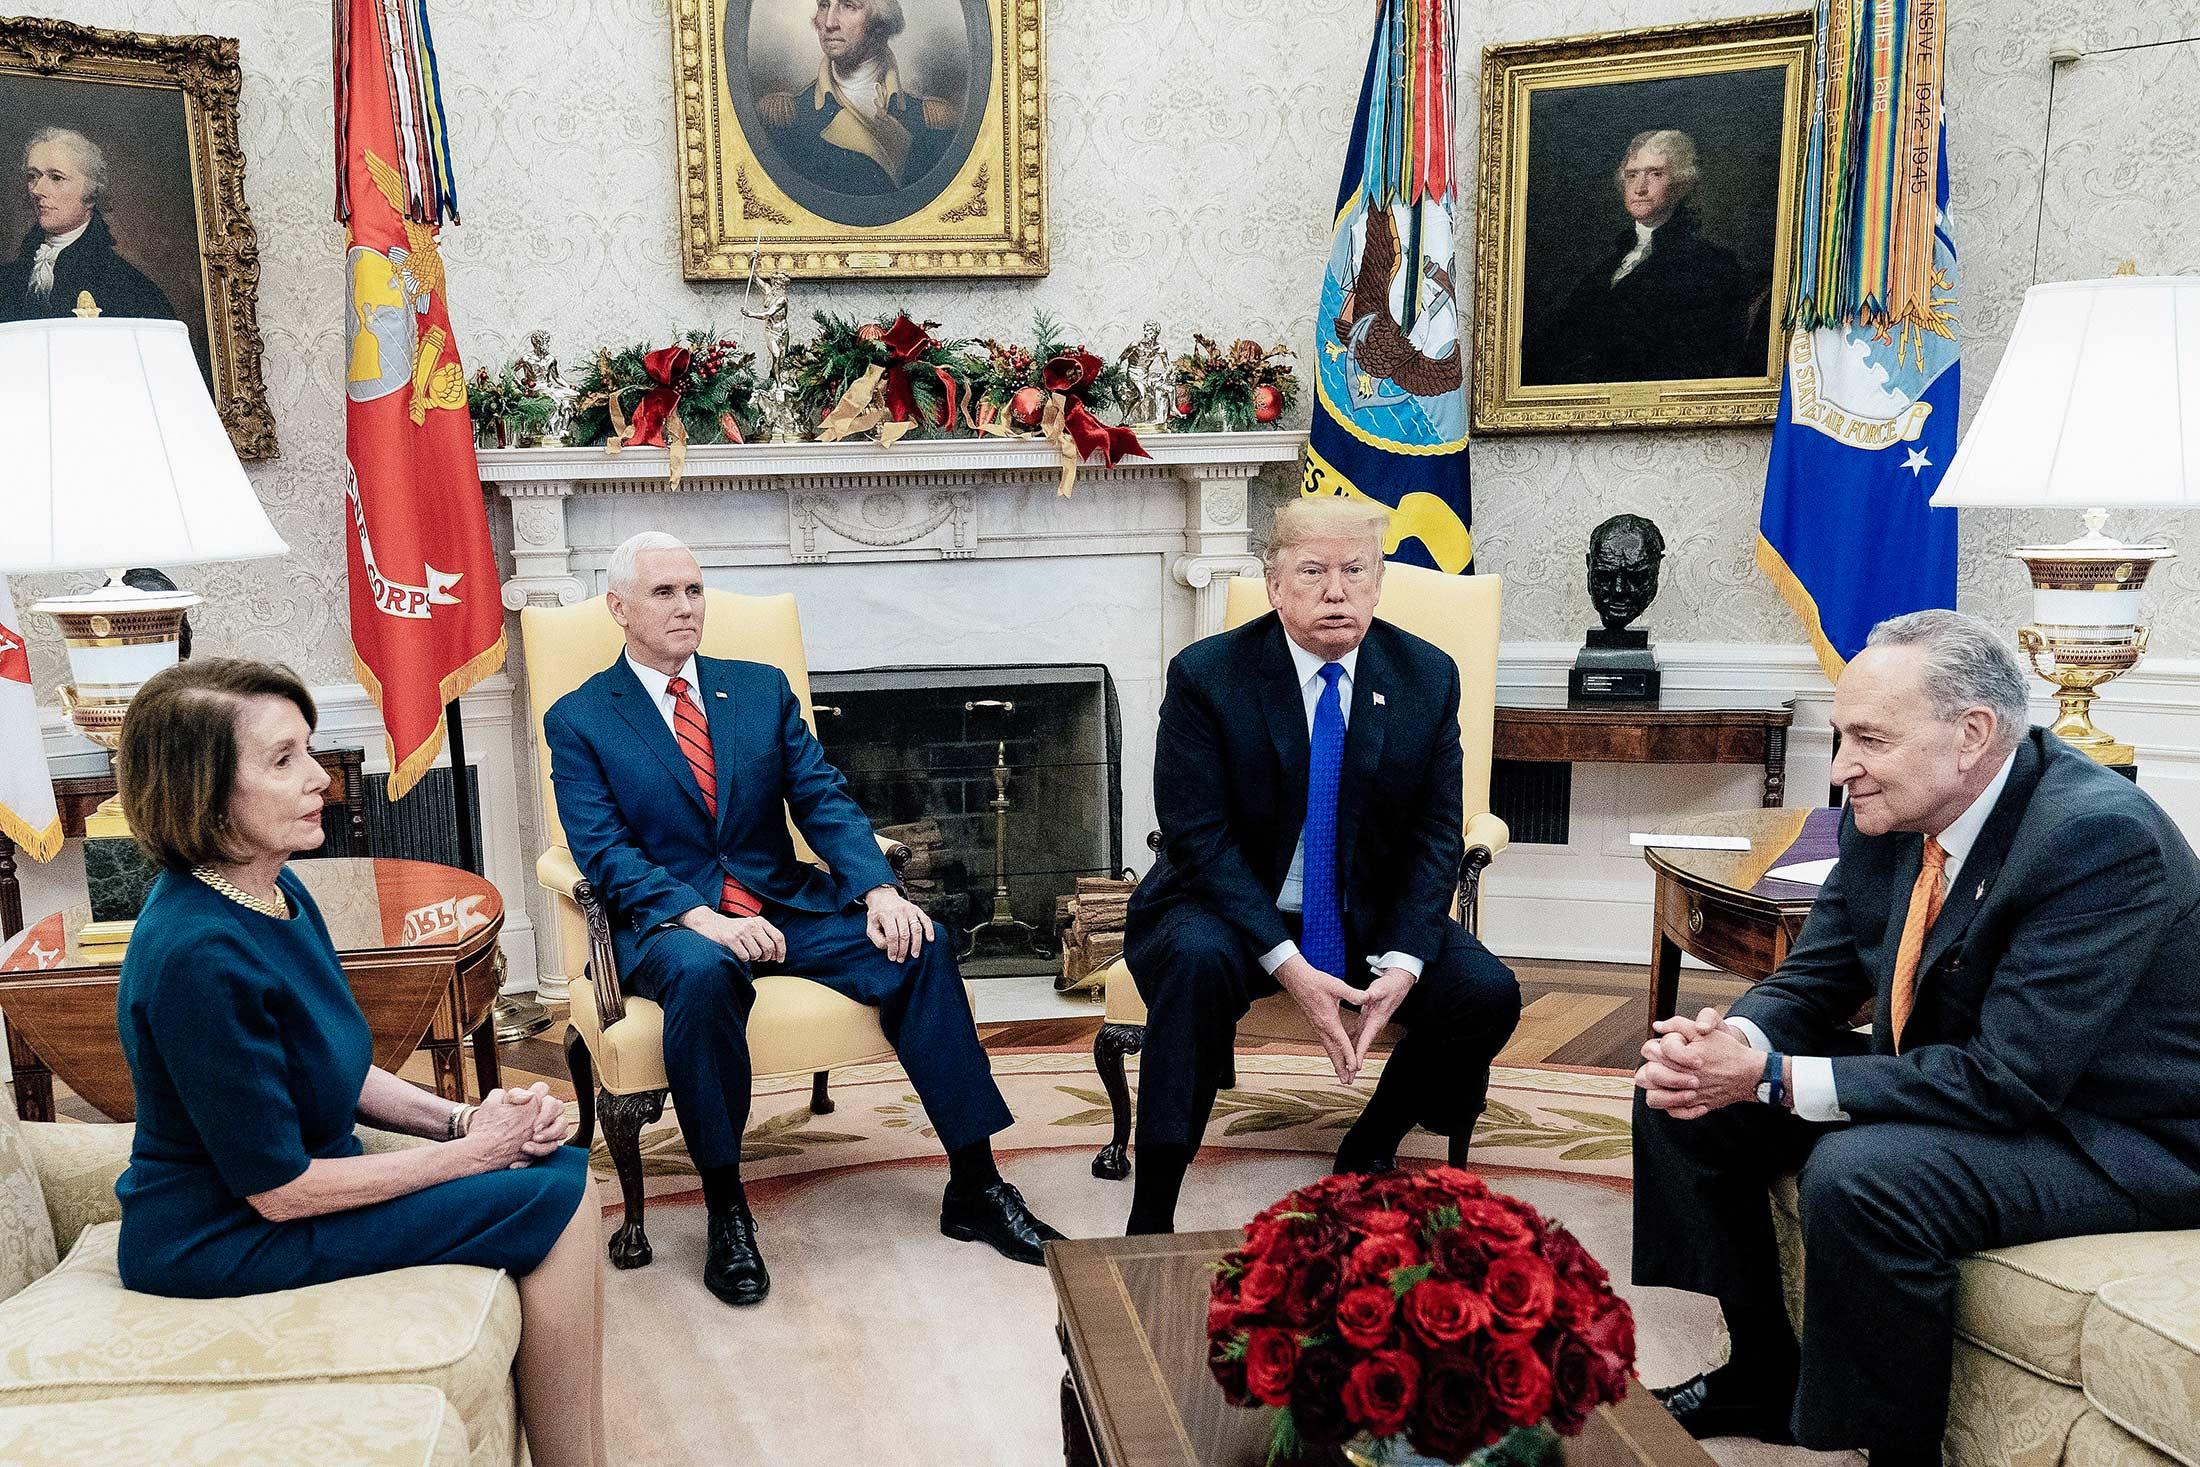 slate.com - Jed Shugerman - Trump's Shutdown Is a Natural Extension of Past GOP Brinkmanship